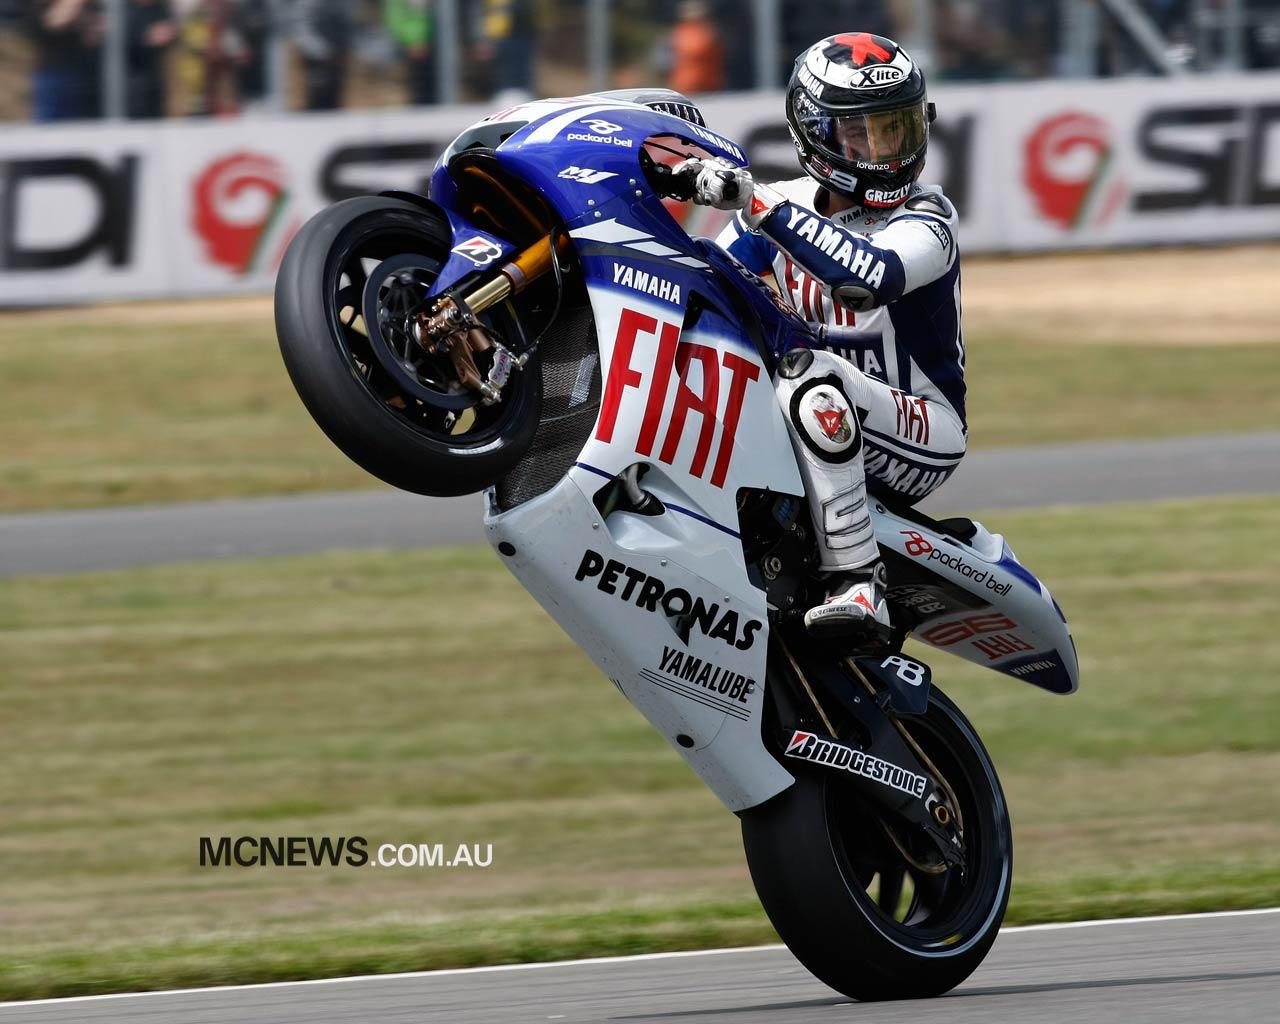 Moto Gp Jorge Lorenzo Wallpaper HD 1280x1024